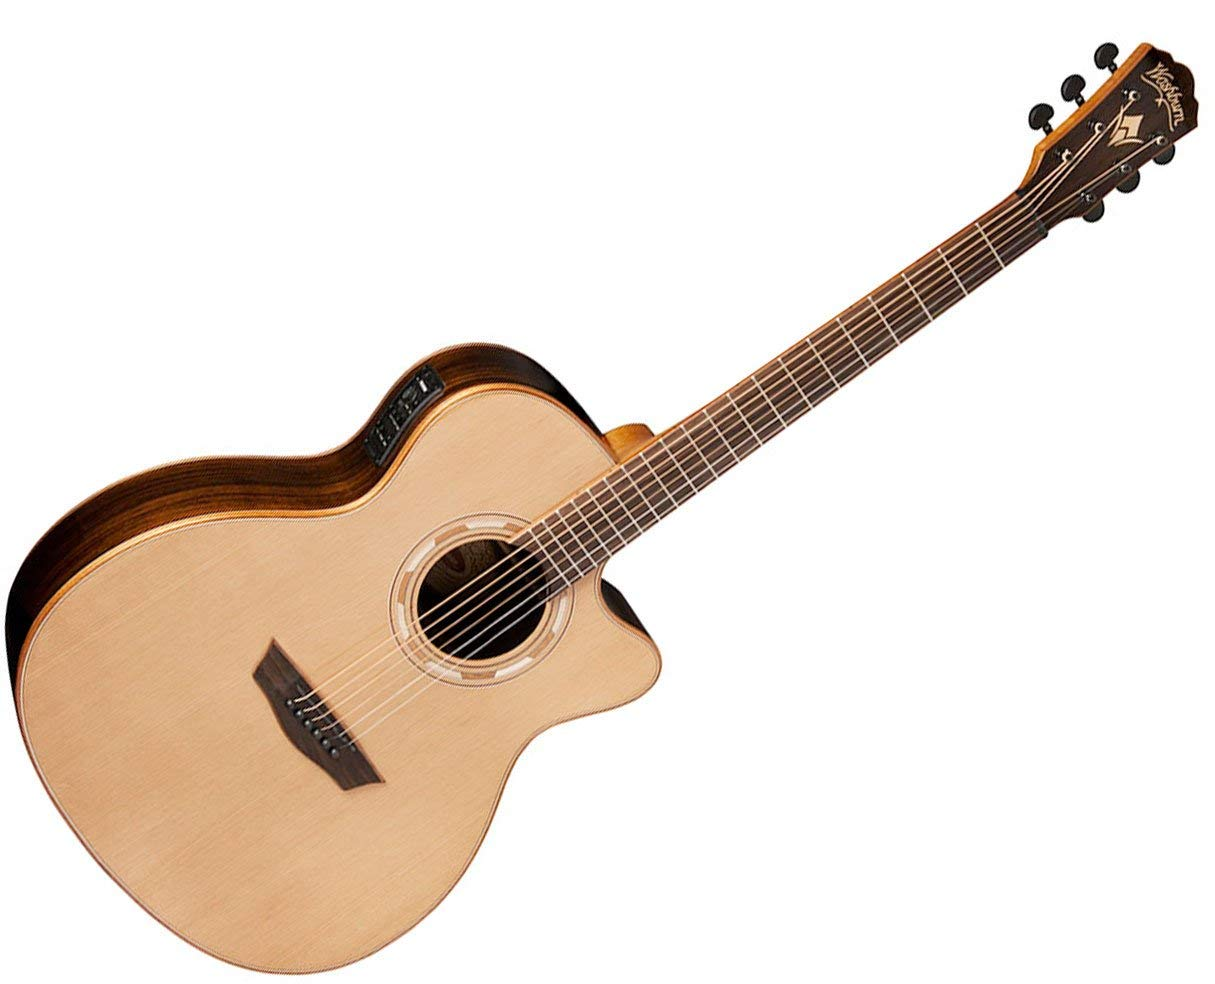 Washburn WLG26SCE Grand Auditorium Acoustic Guitar - Natural